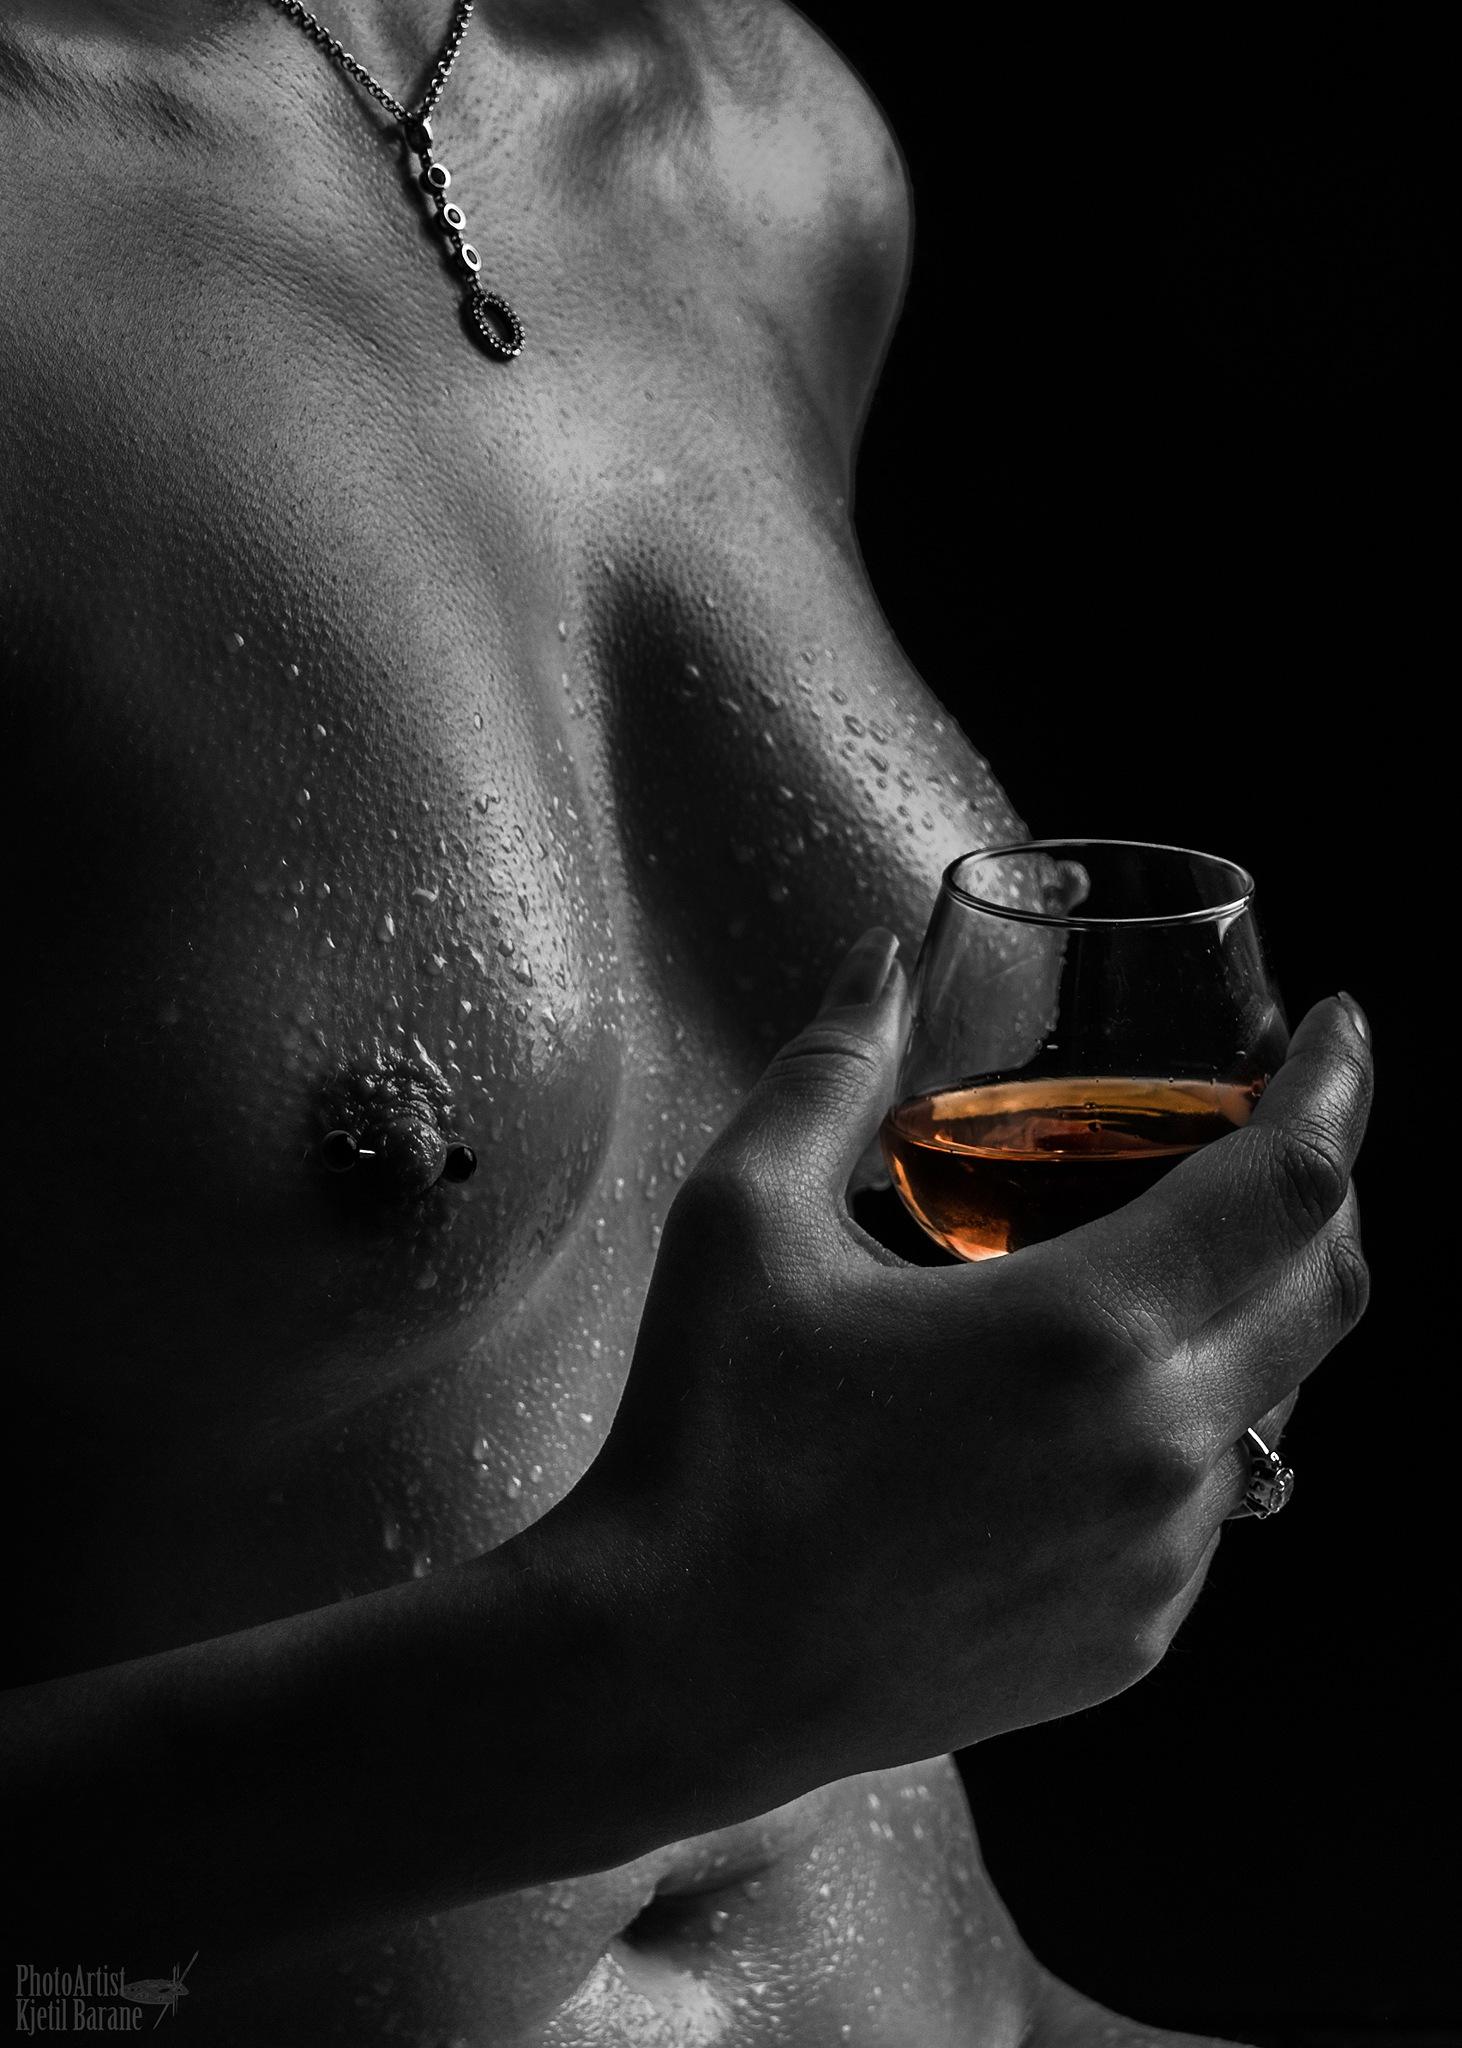 Late night cognac by Kjetil Barane